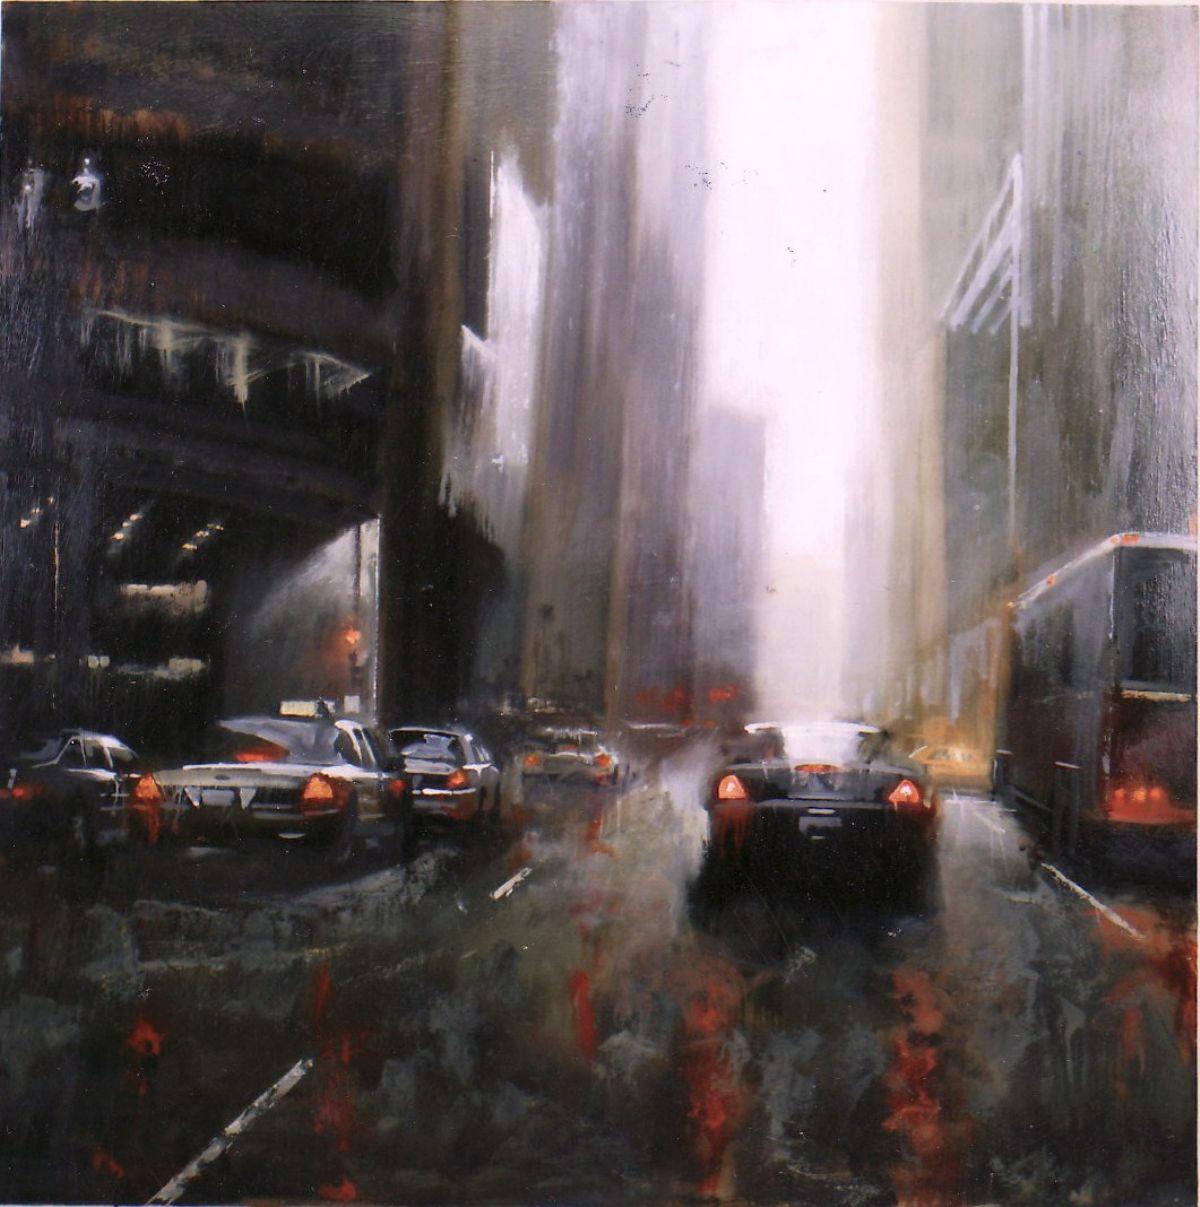 Canyon artwork by Robert Brasher - art listed for sale on Artplode